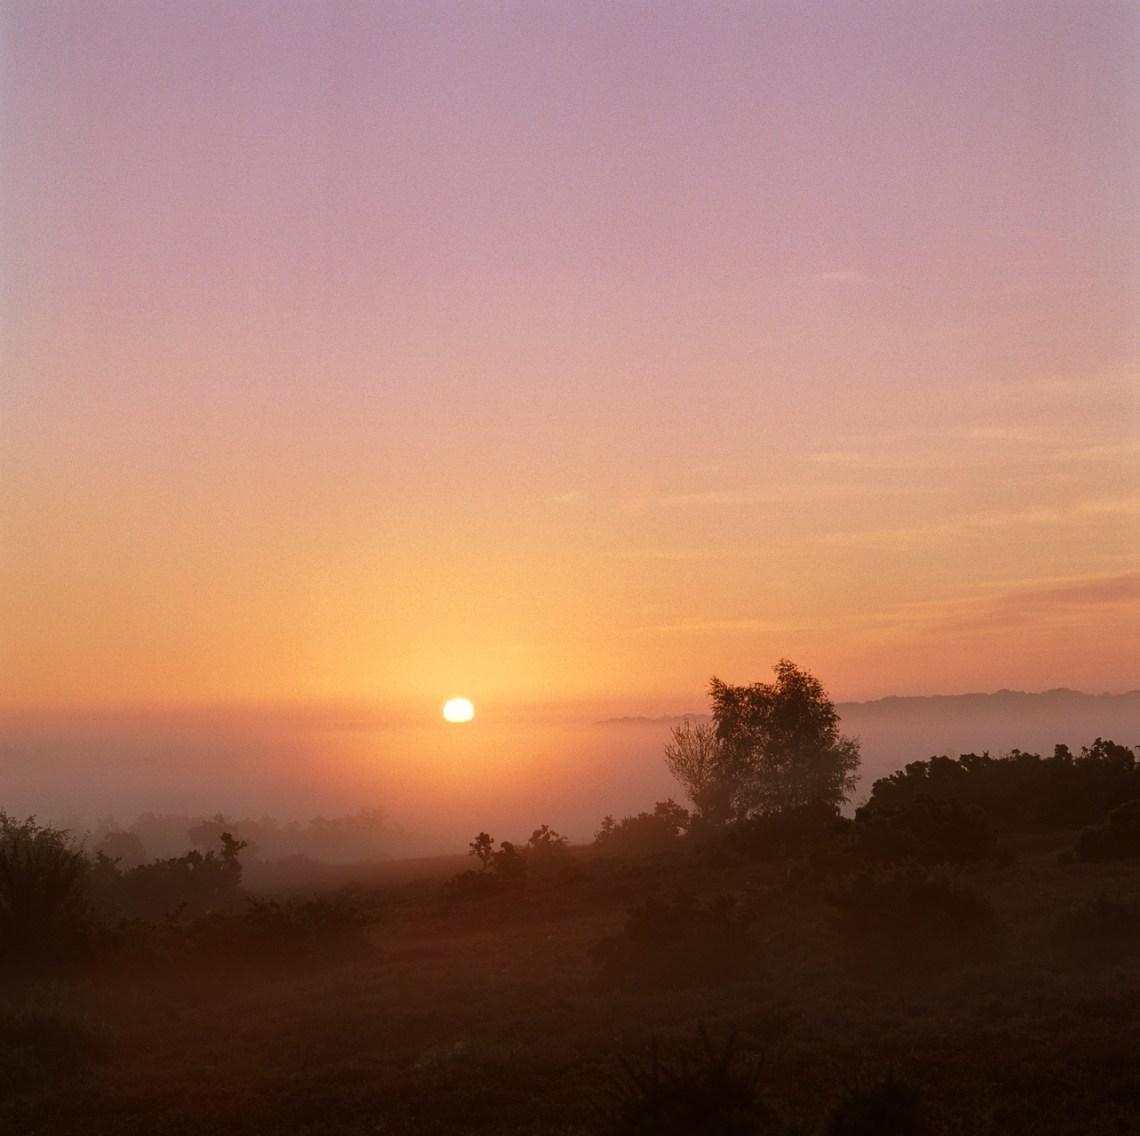 Sunrise-New-Forest.10.CPRE.Arrowsmith.jpg